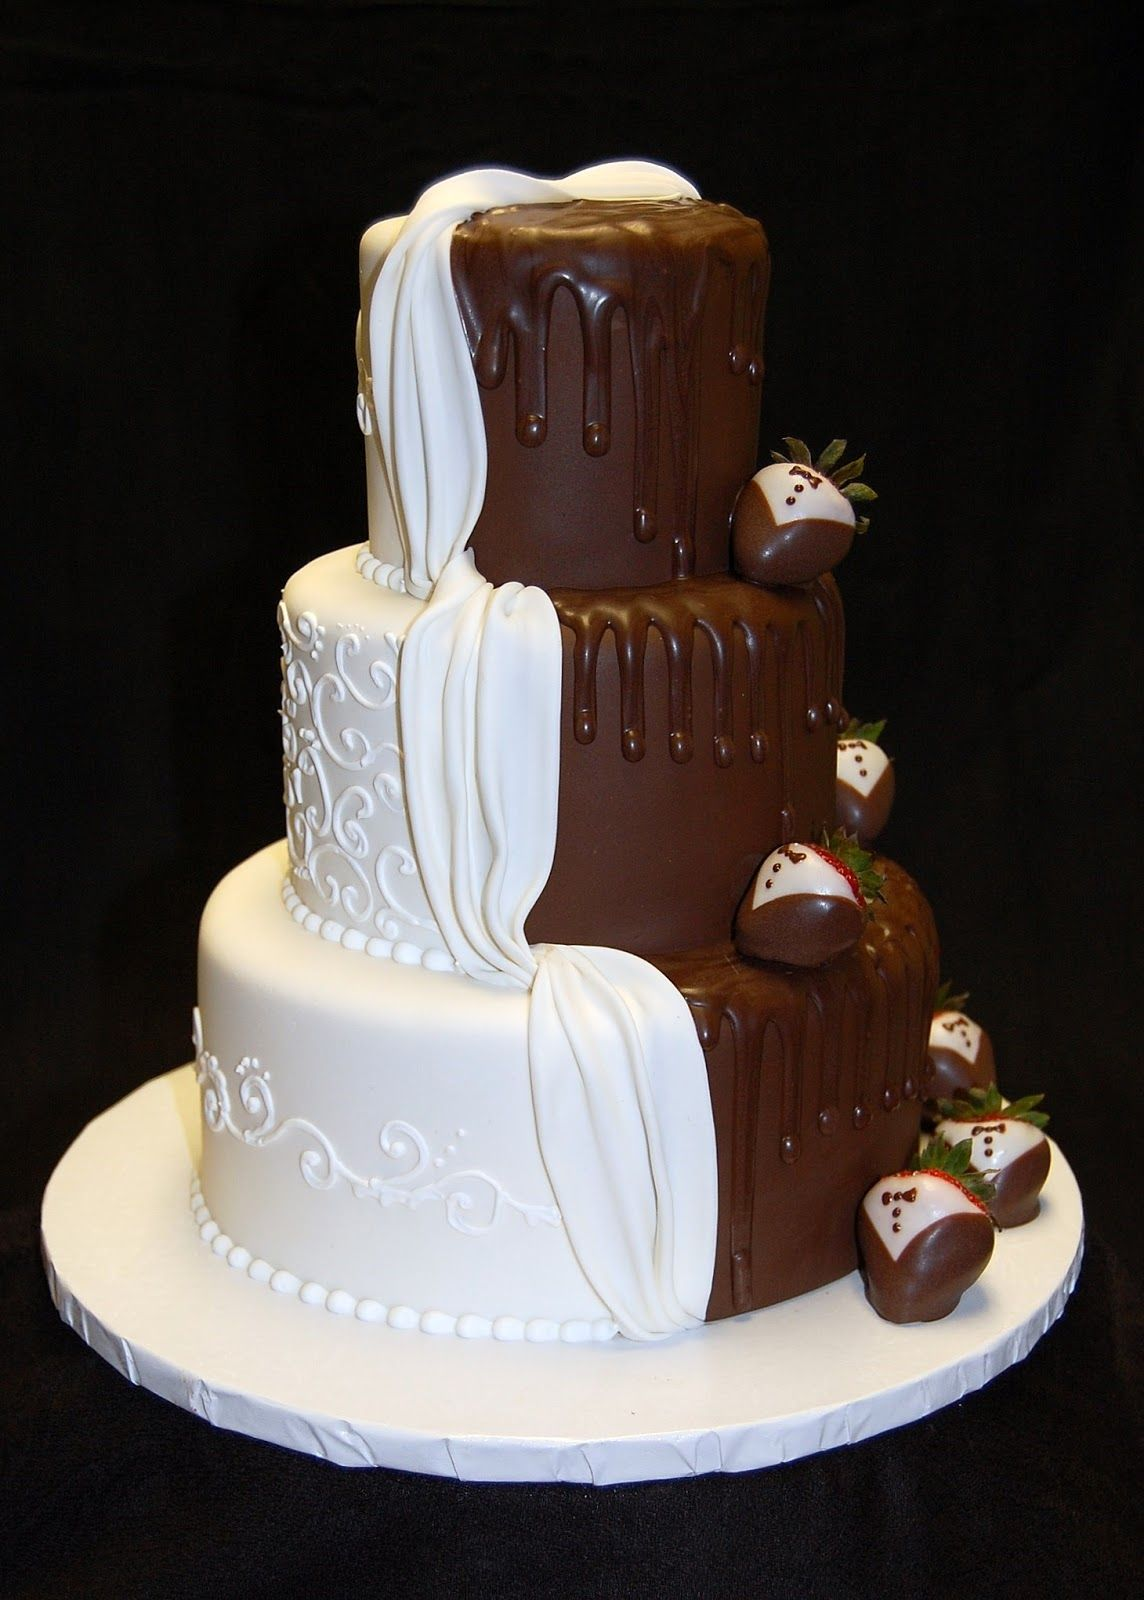 Unique Chocolate Cake Images : Bride and Groom Cake Together Bride+%26+Groom+Wedding ...